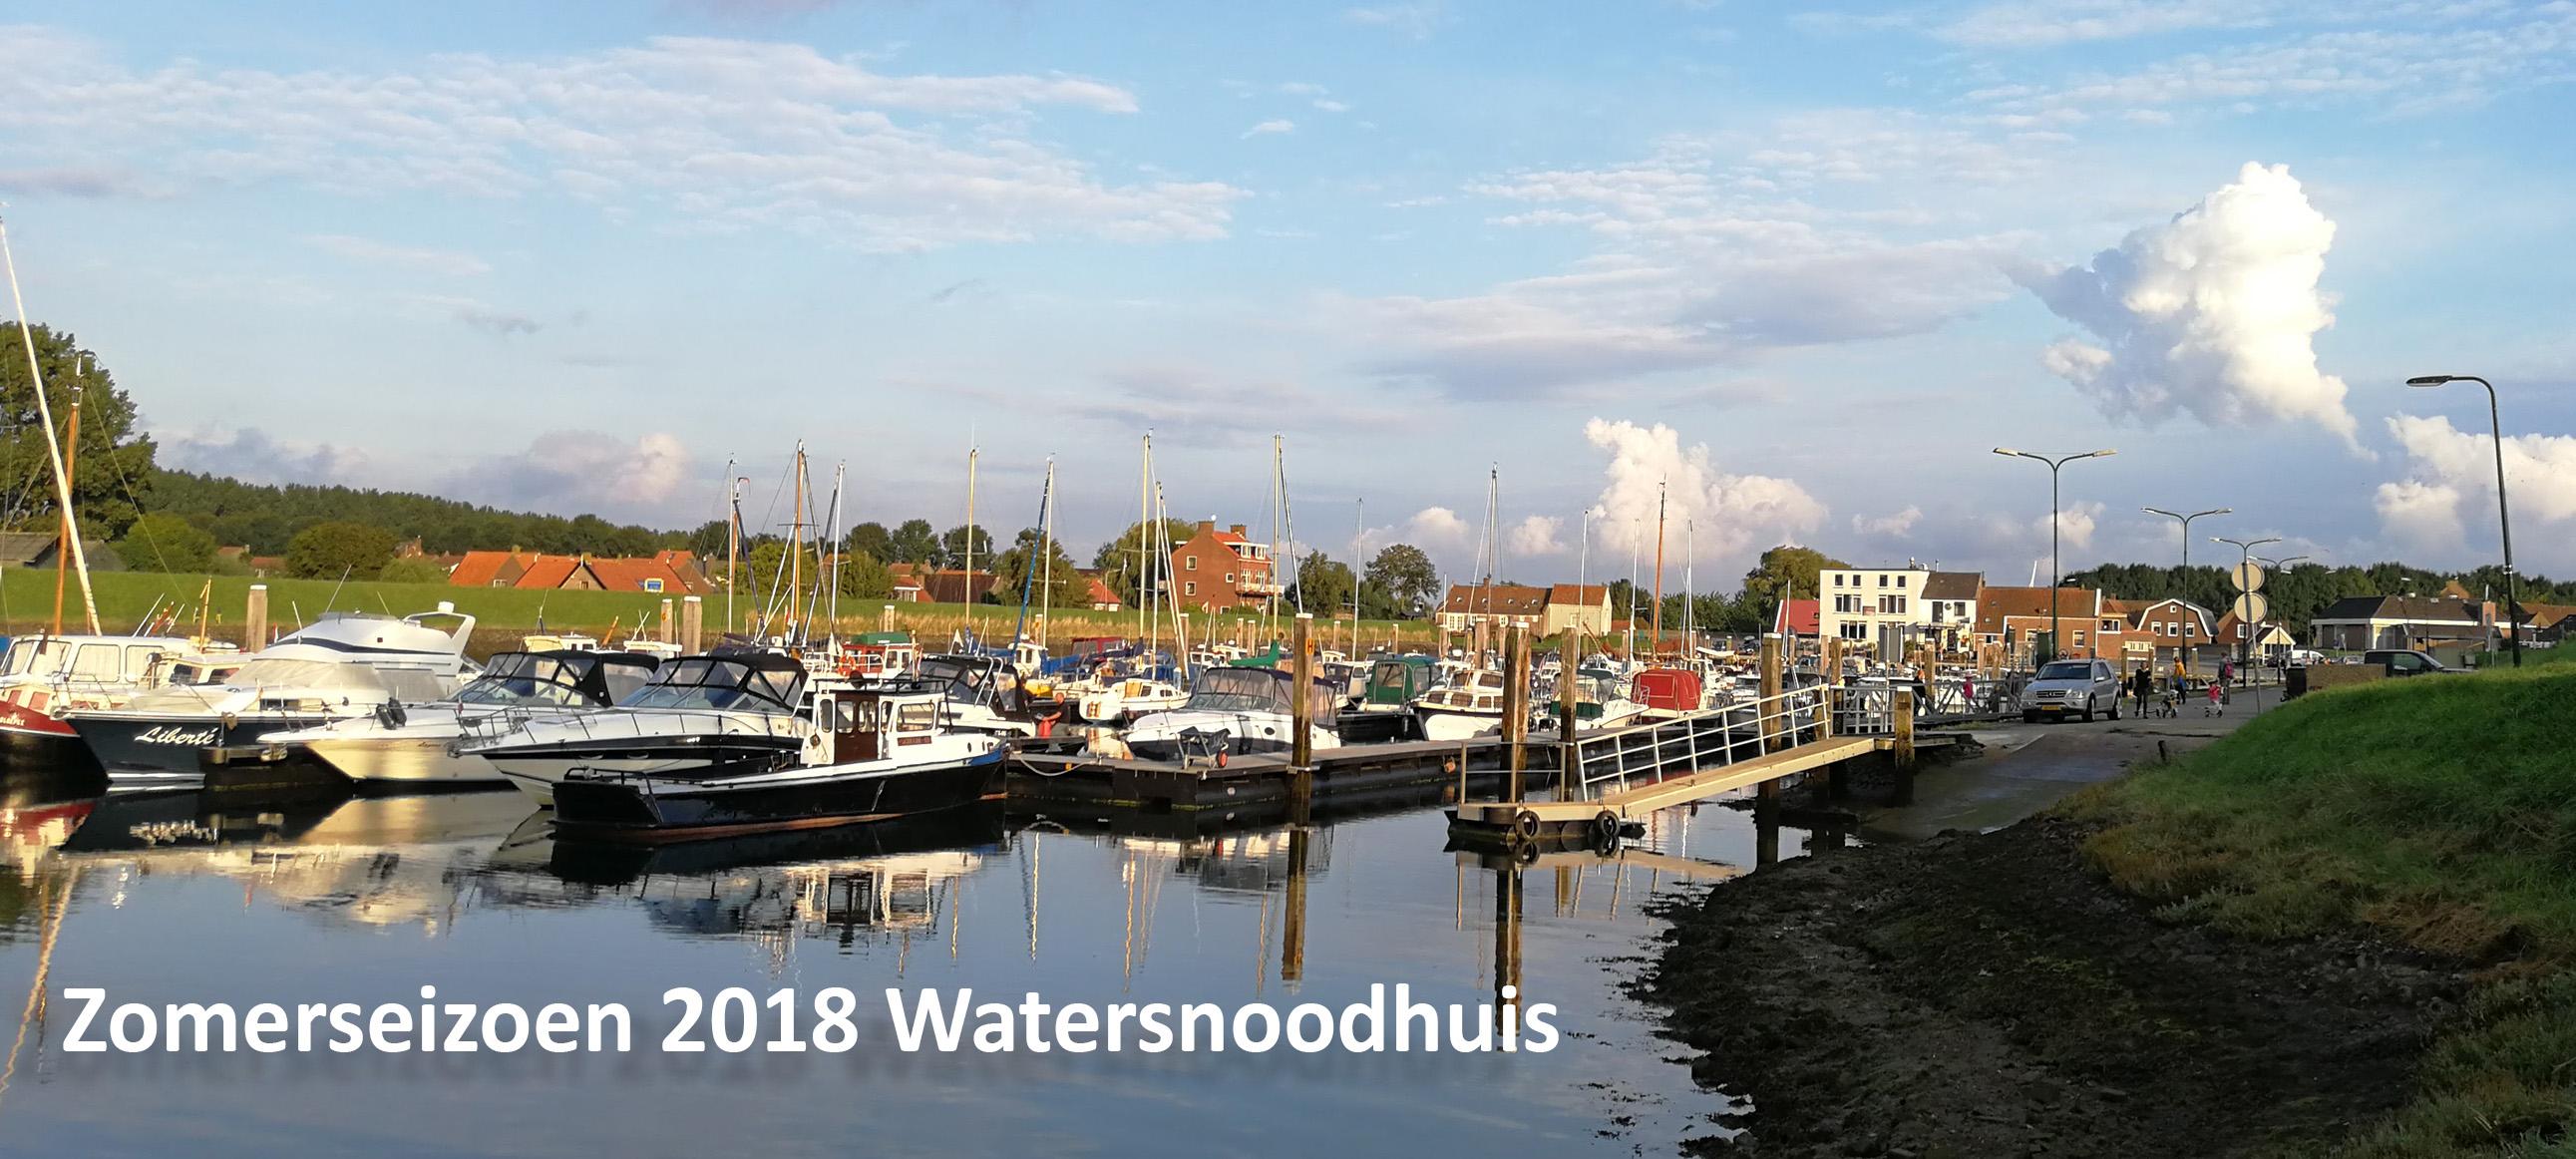 Zomerseizoen 2018 Watersnoodhuis